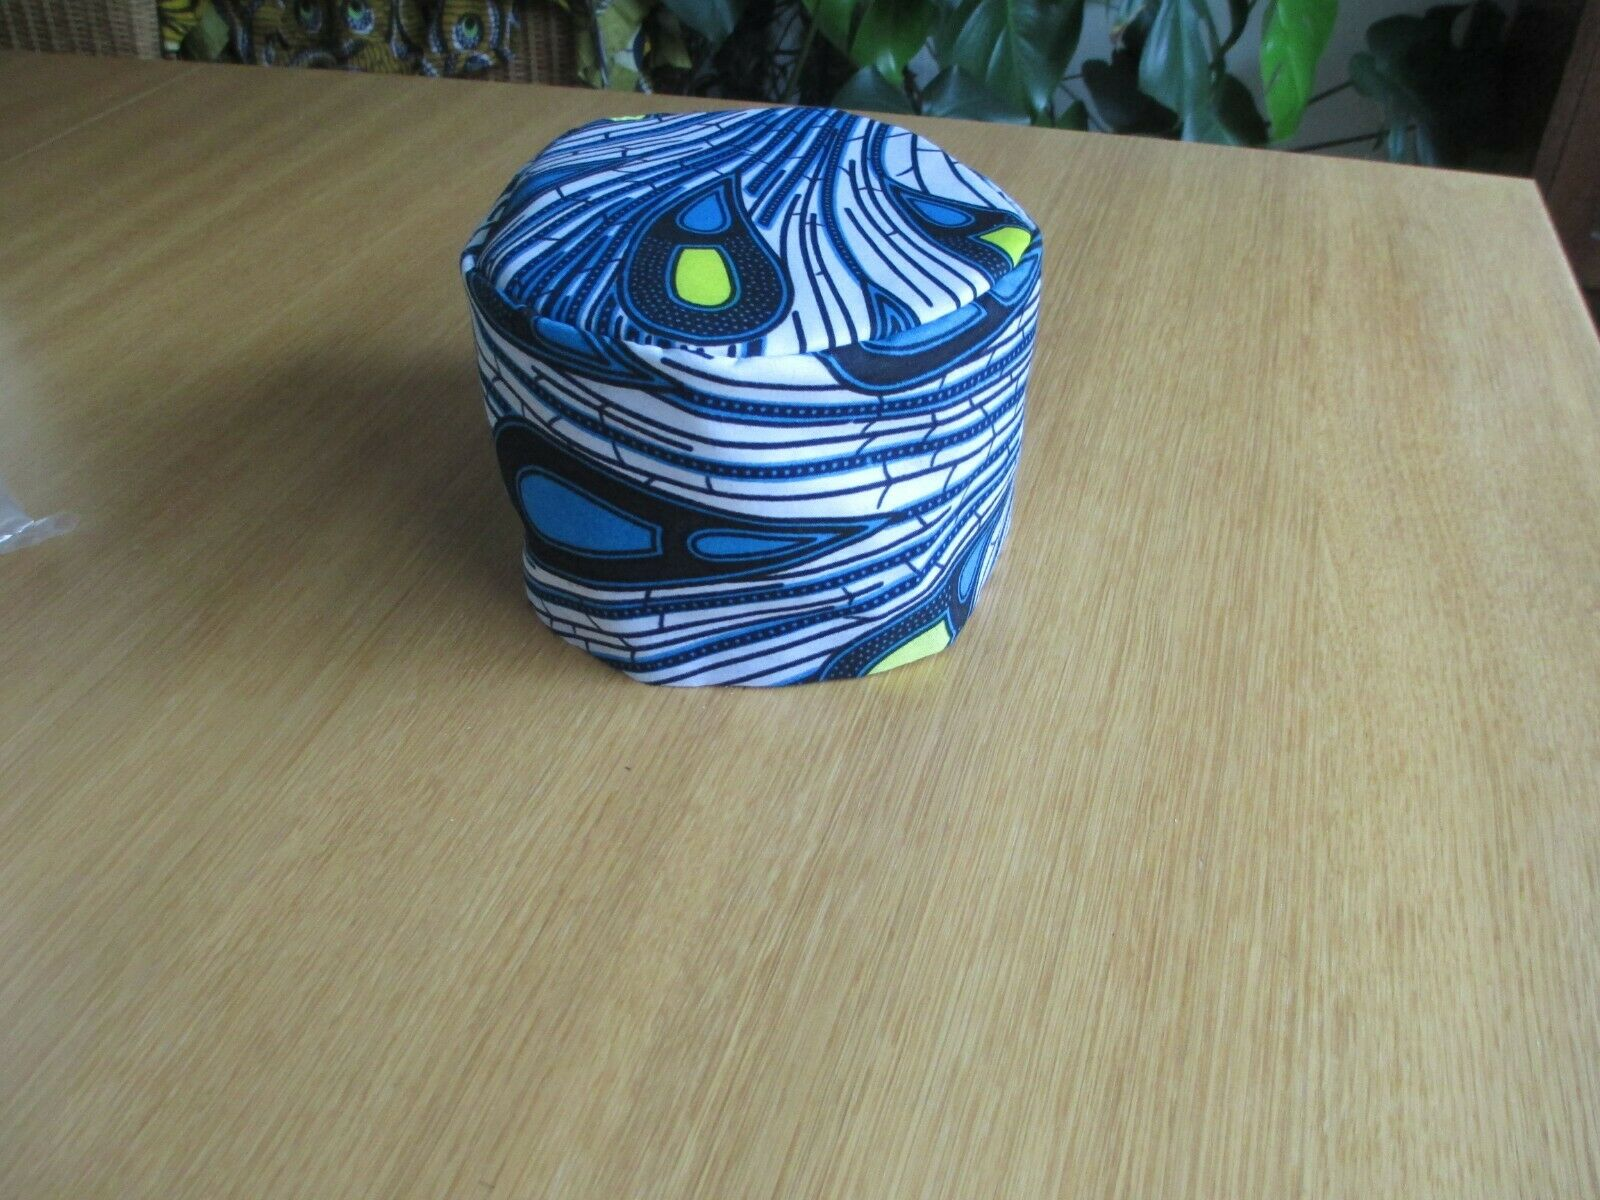 Unisex African Style Kufi Hat Blue Black White African Cotton Ethnic